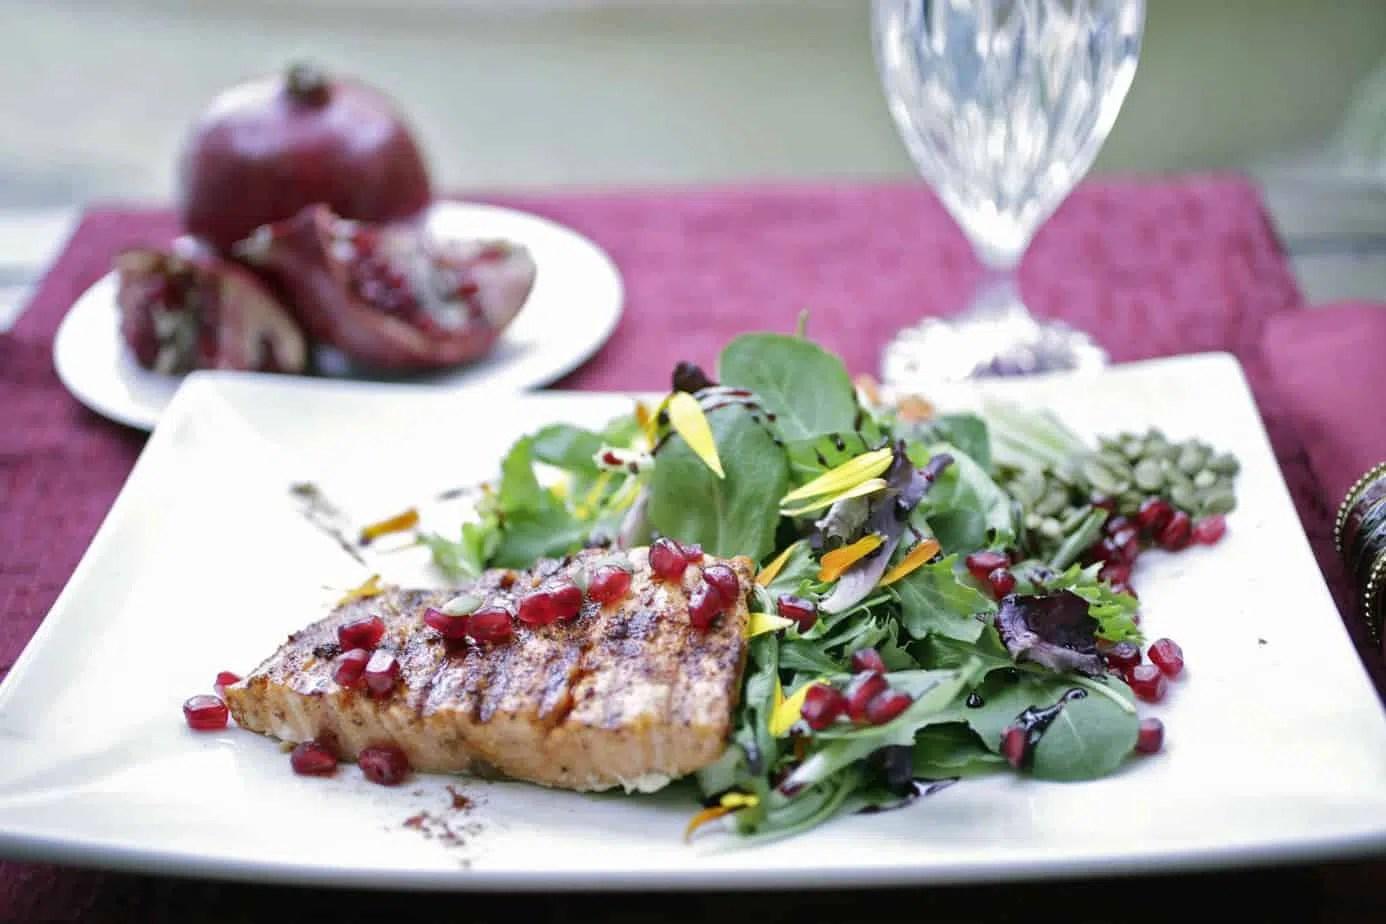 Pomegranate Pepita Salad With Salmon